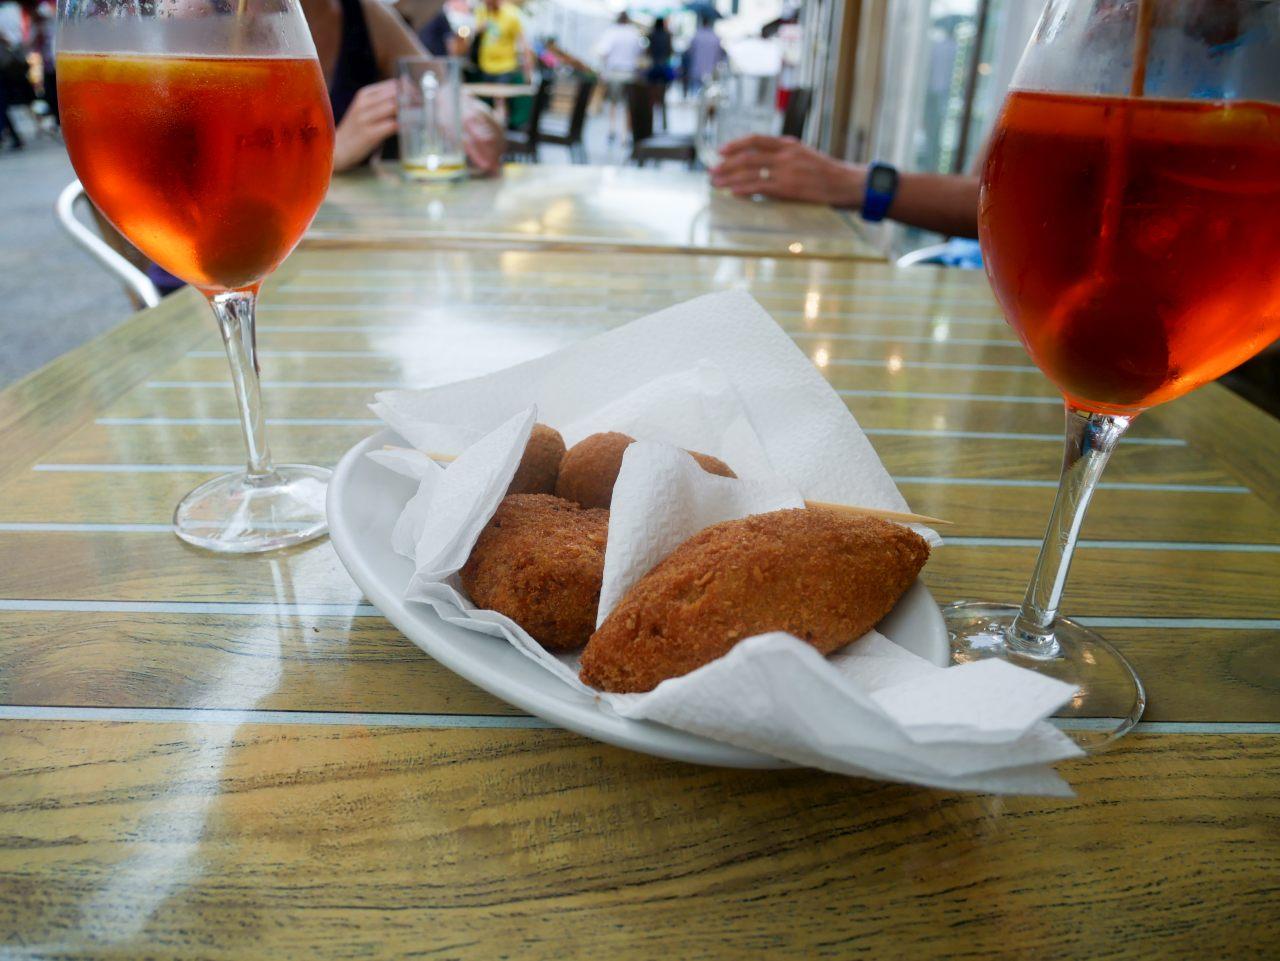 meilleurs cicchetti de Venise: Da Luca & Fred